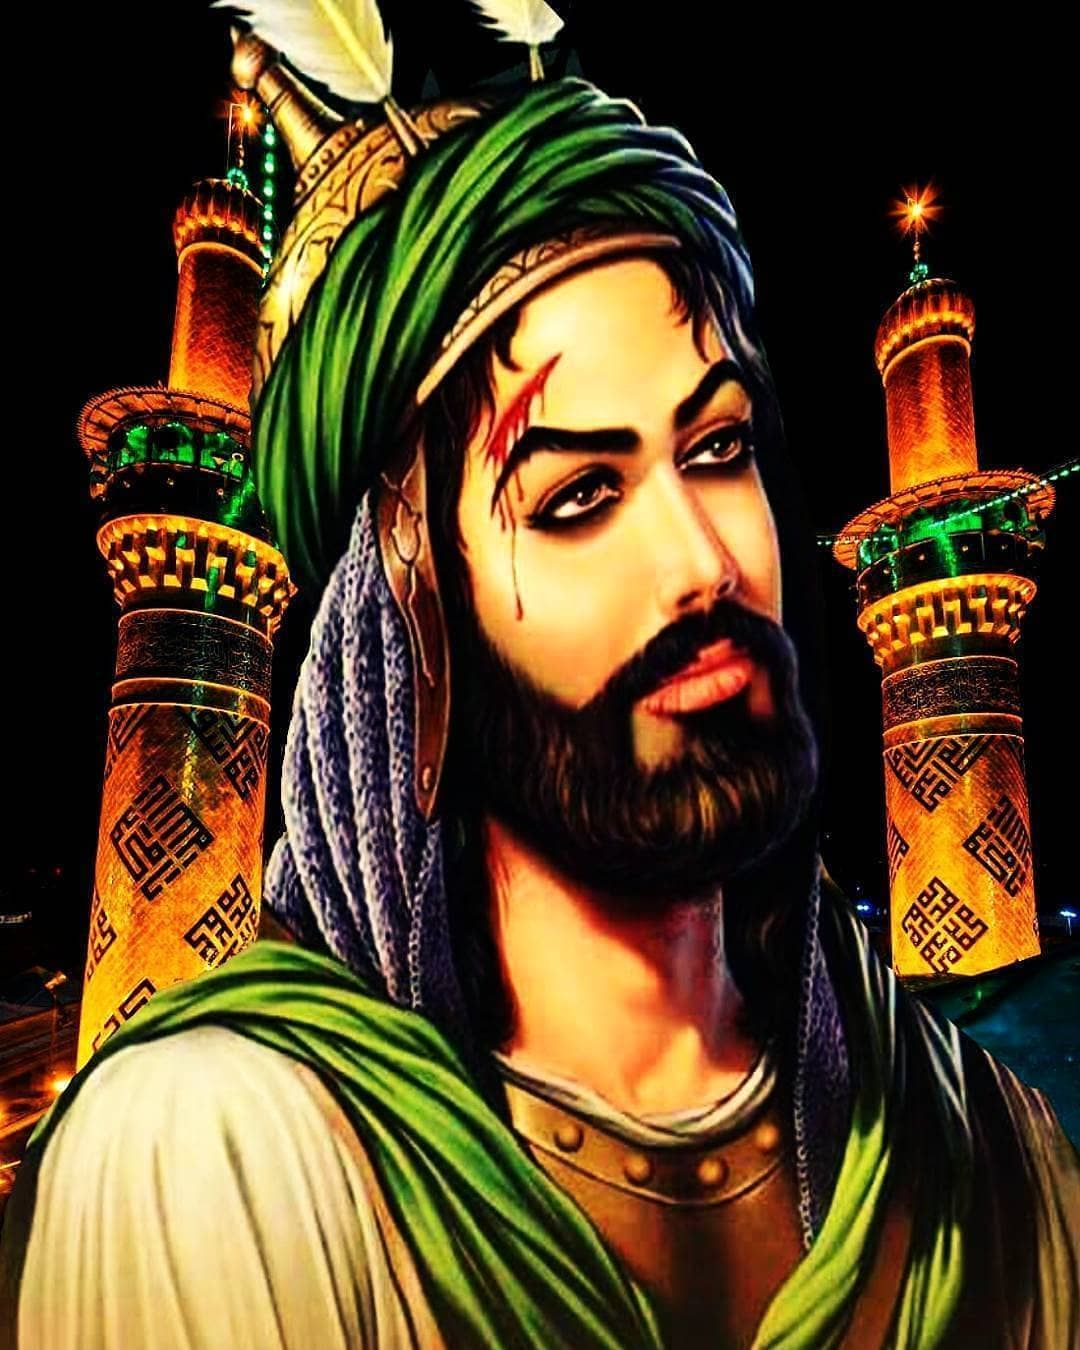 Instagram Beitrag Von Baku Azerbaycan Mai 24 2019 Um 5 16 Utc Karbala Photography Islamic Paintings Islamic Pictures